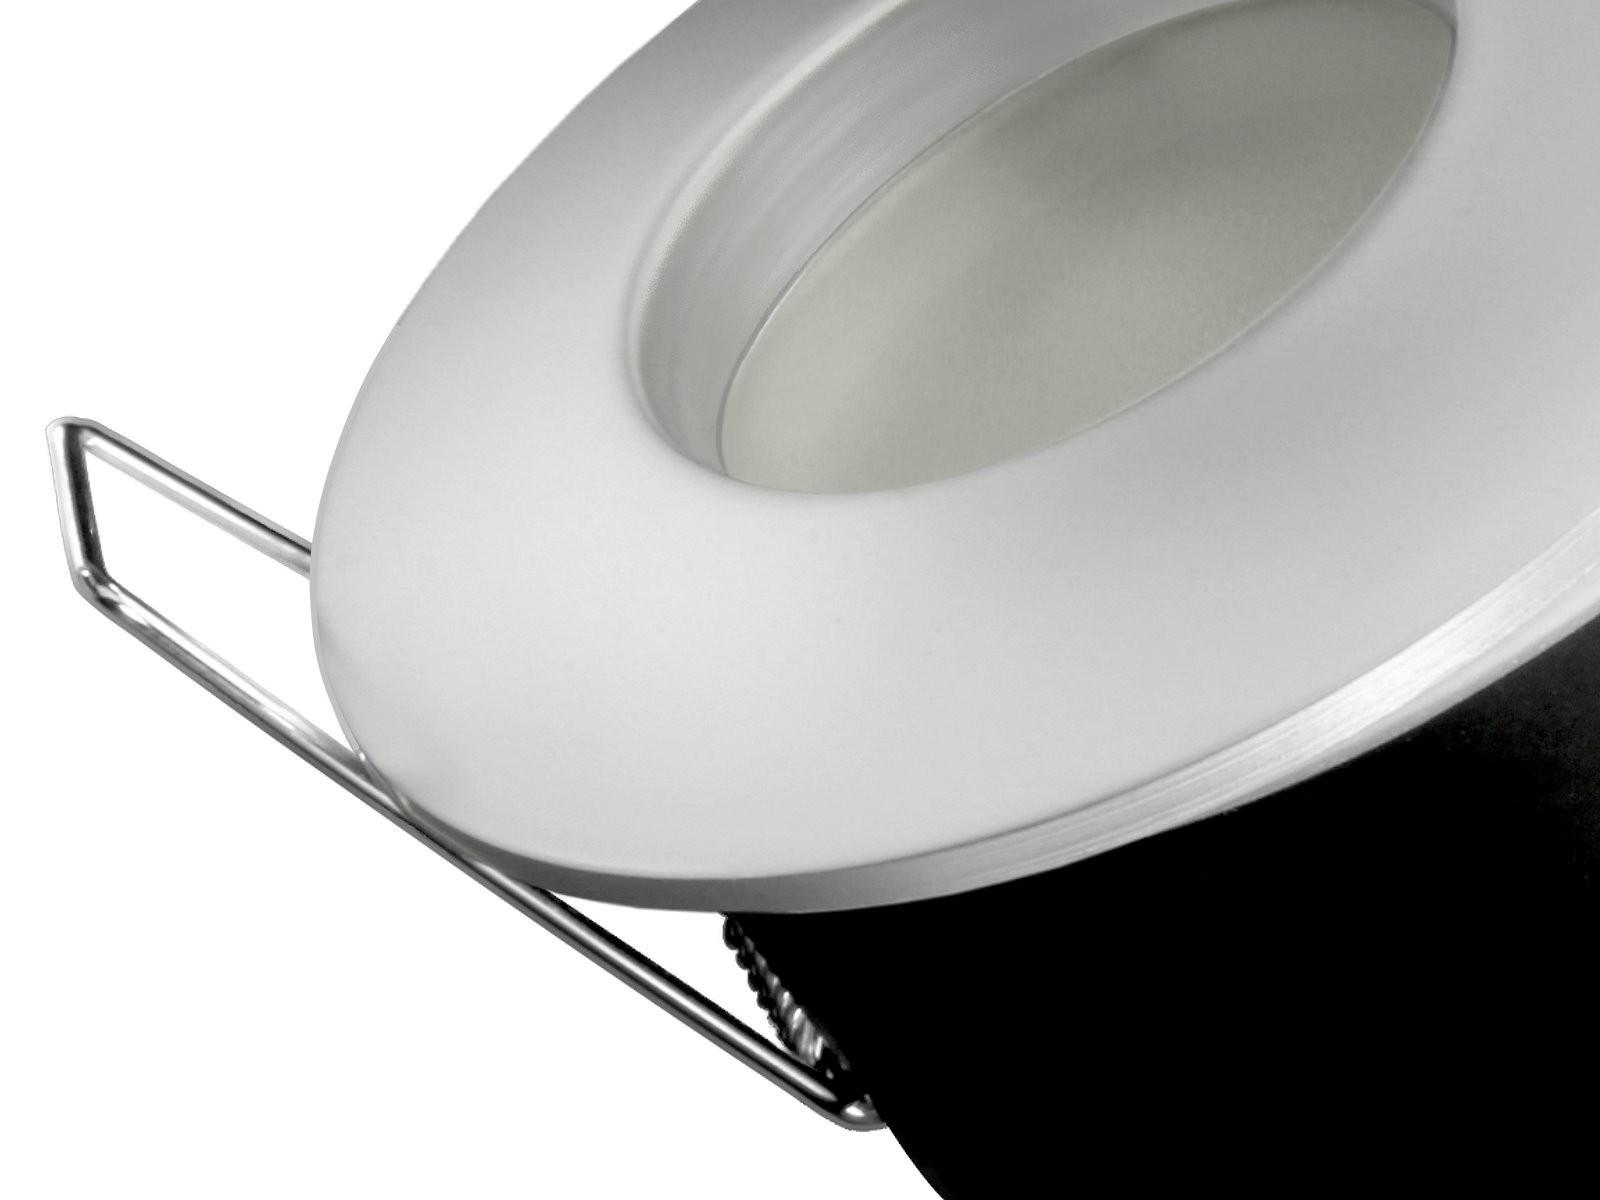 rw 1 led einbaustrahler spot bad dusche chrom matt ip65 4 3w warmwei gu10 230v osram led star. Black Bedroom Furniture Sets. Home Design Ideas